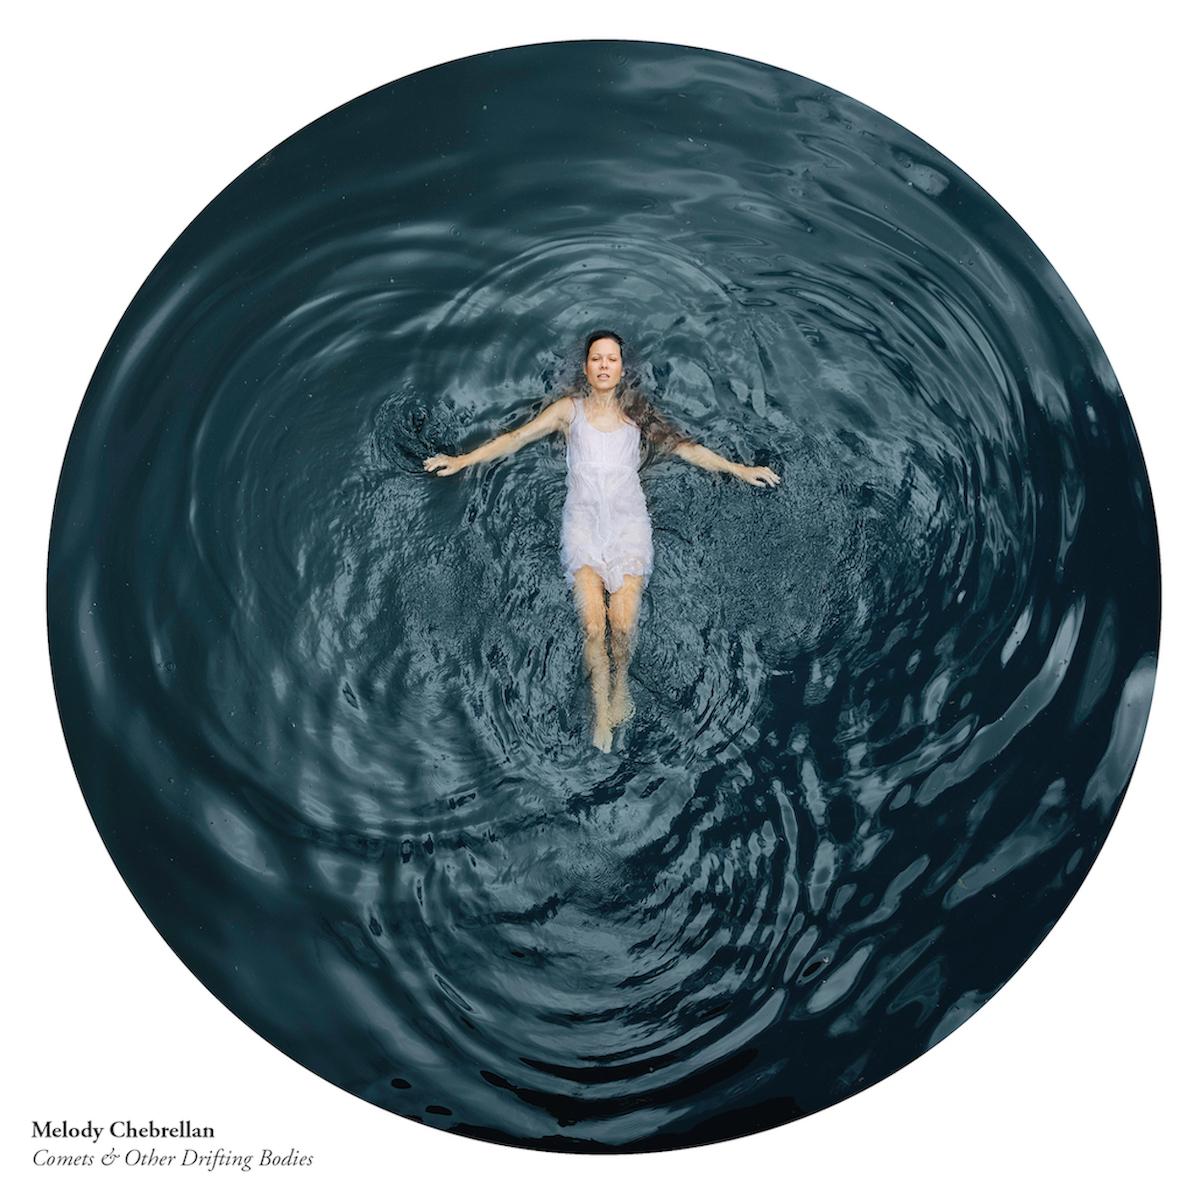 Comets & other drifting bodies Album Cover, Melody Chebrellan, Thomas Allison